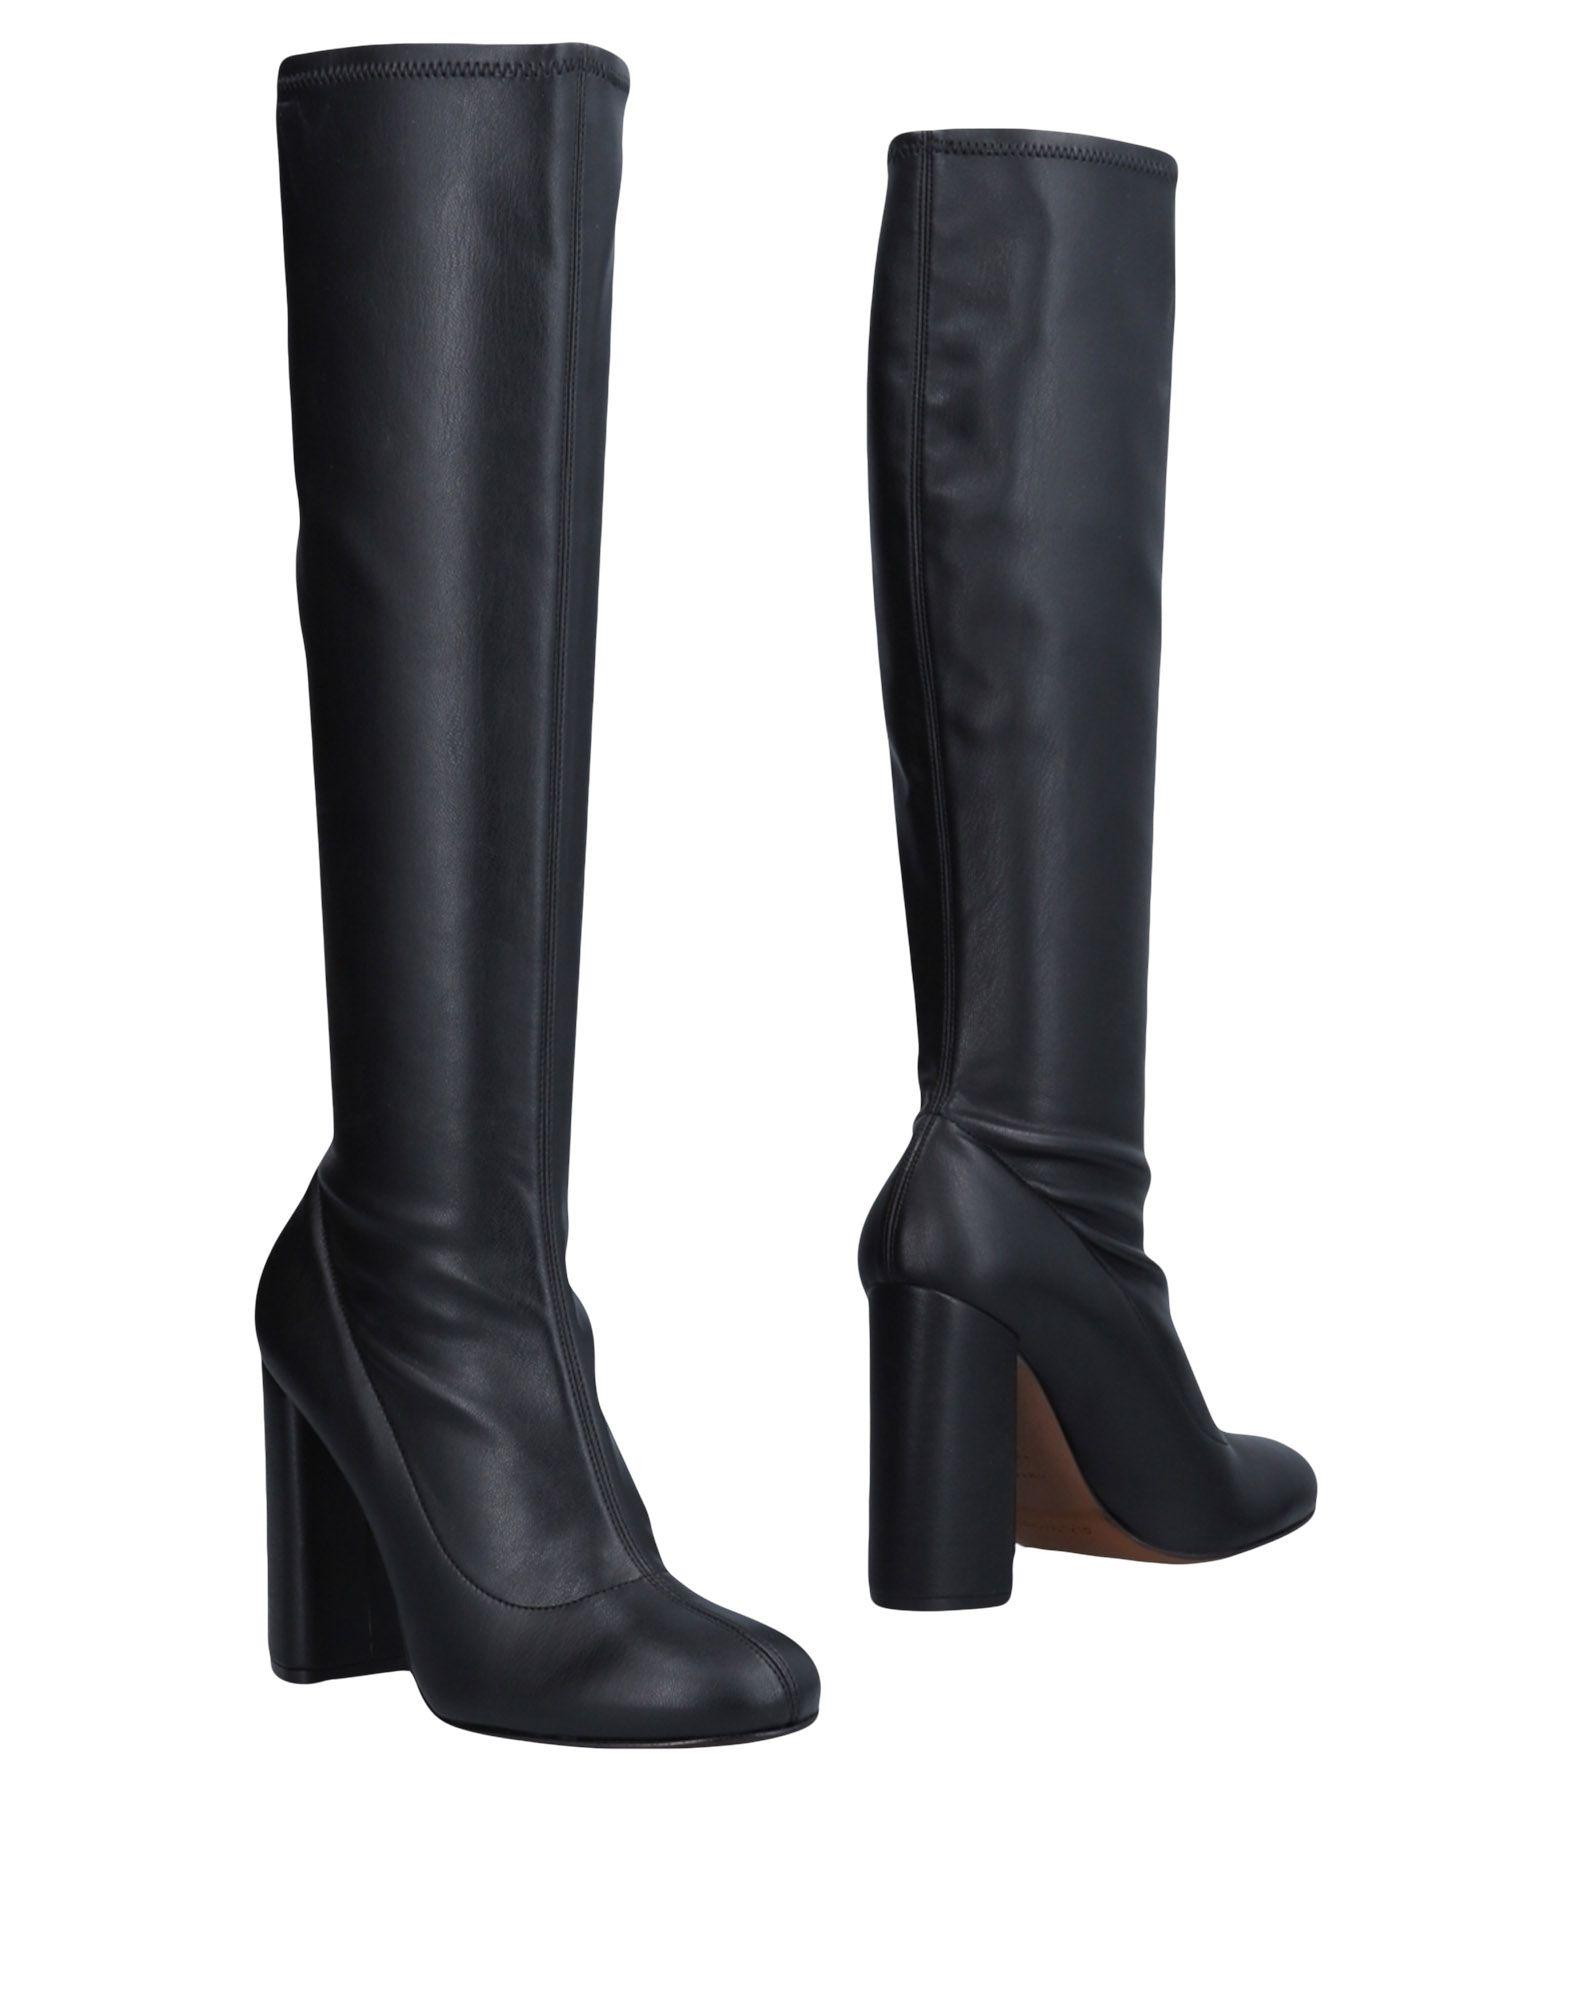 Rabatt Schuhe L' Autre Chose Stiefel Damen  13192289NL